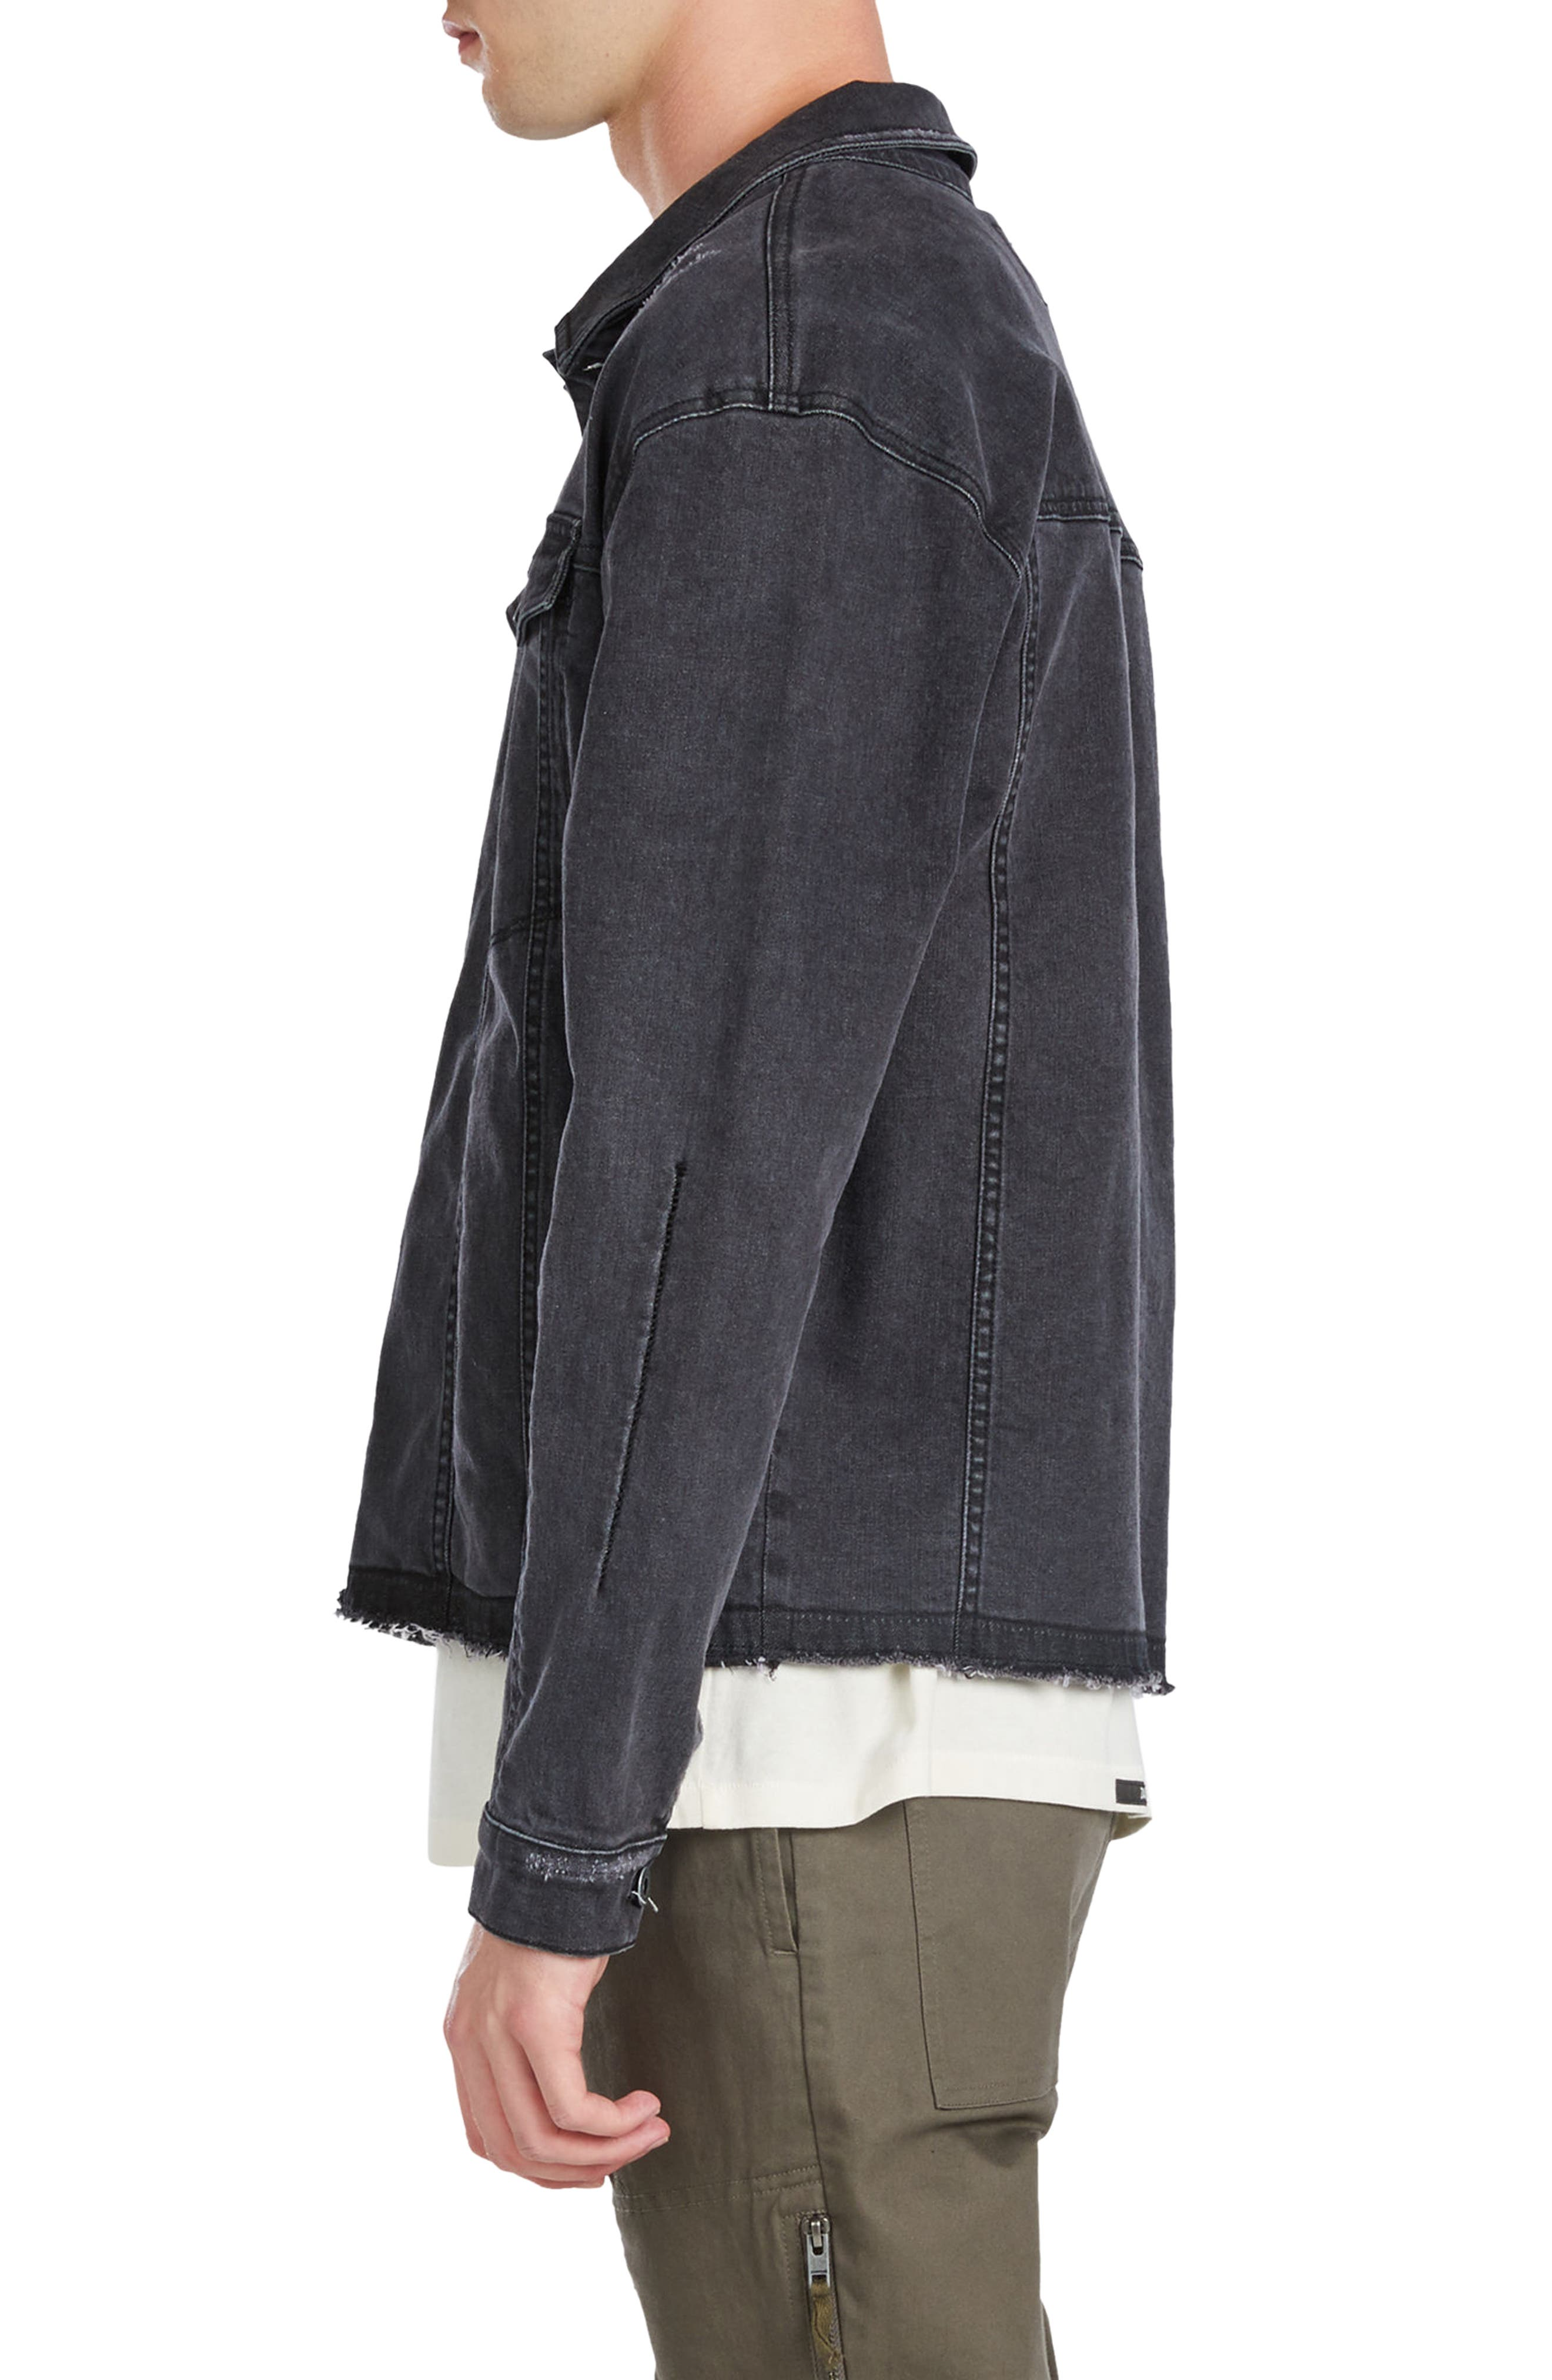 Snitch Denim Jacket,                             Alternate thumbnail 3, color,                             Black